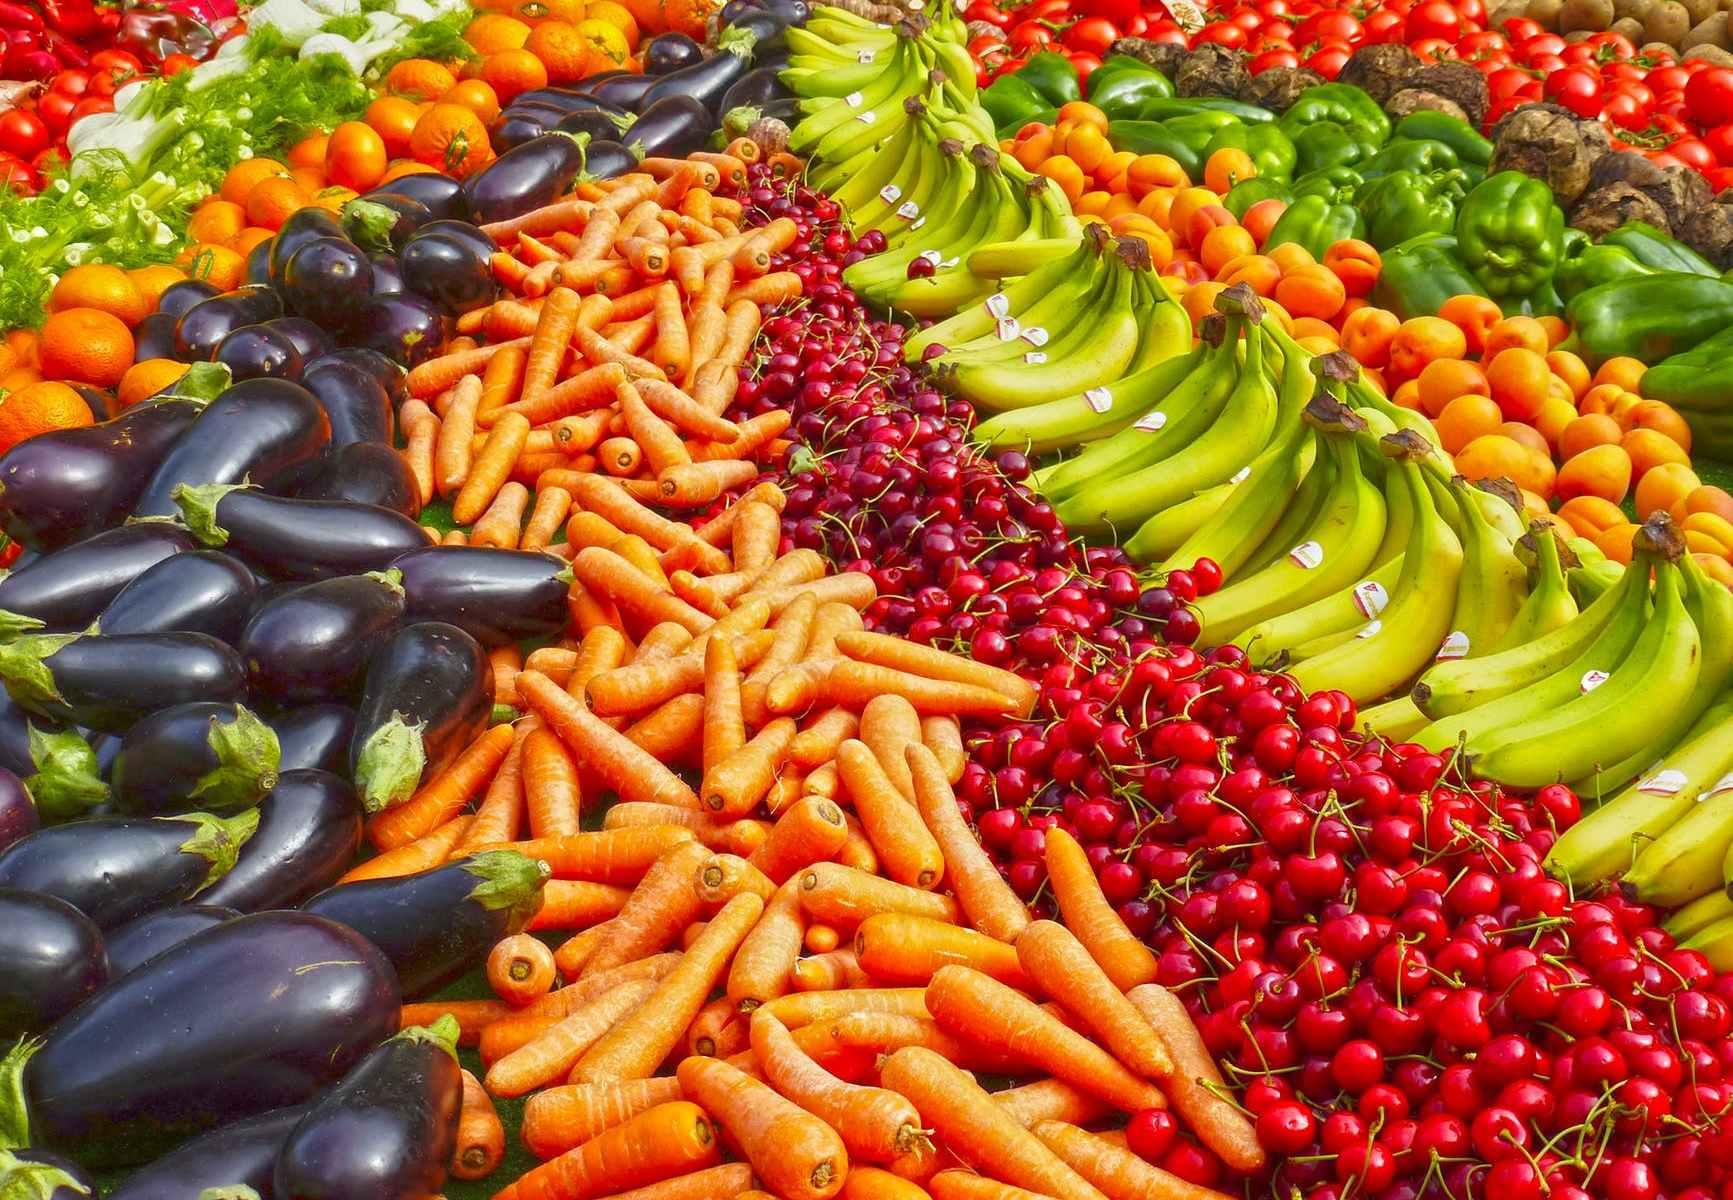 food allergies- a parent's nightmare